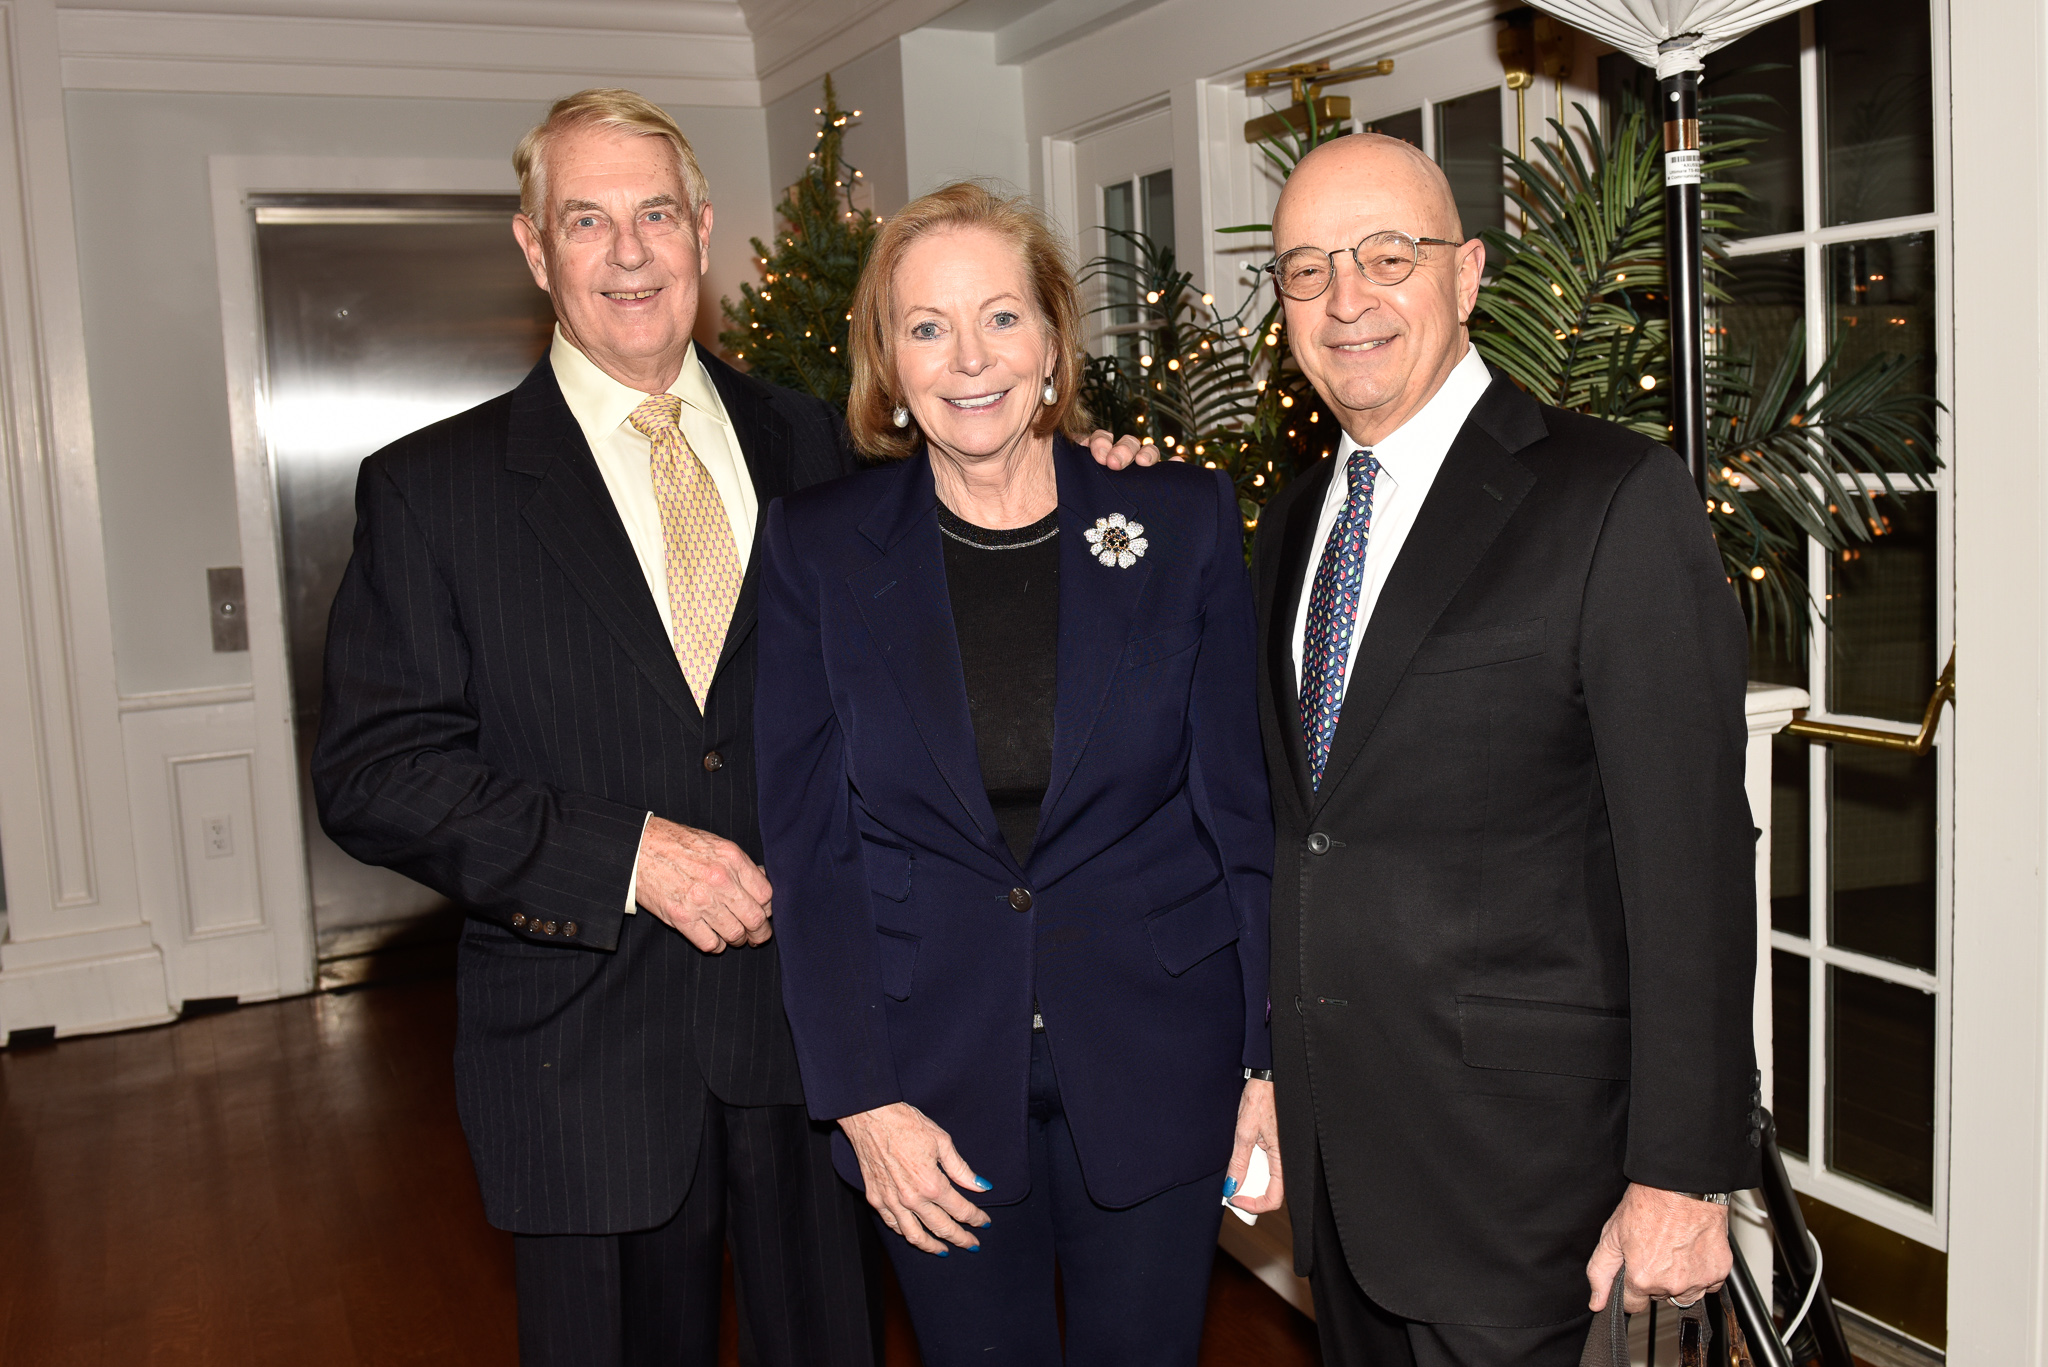 John and Patricia Chadwick, Jan Rogers Kniffen